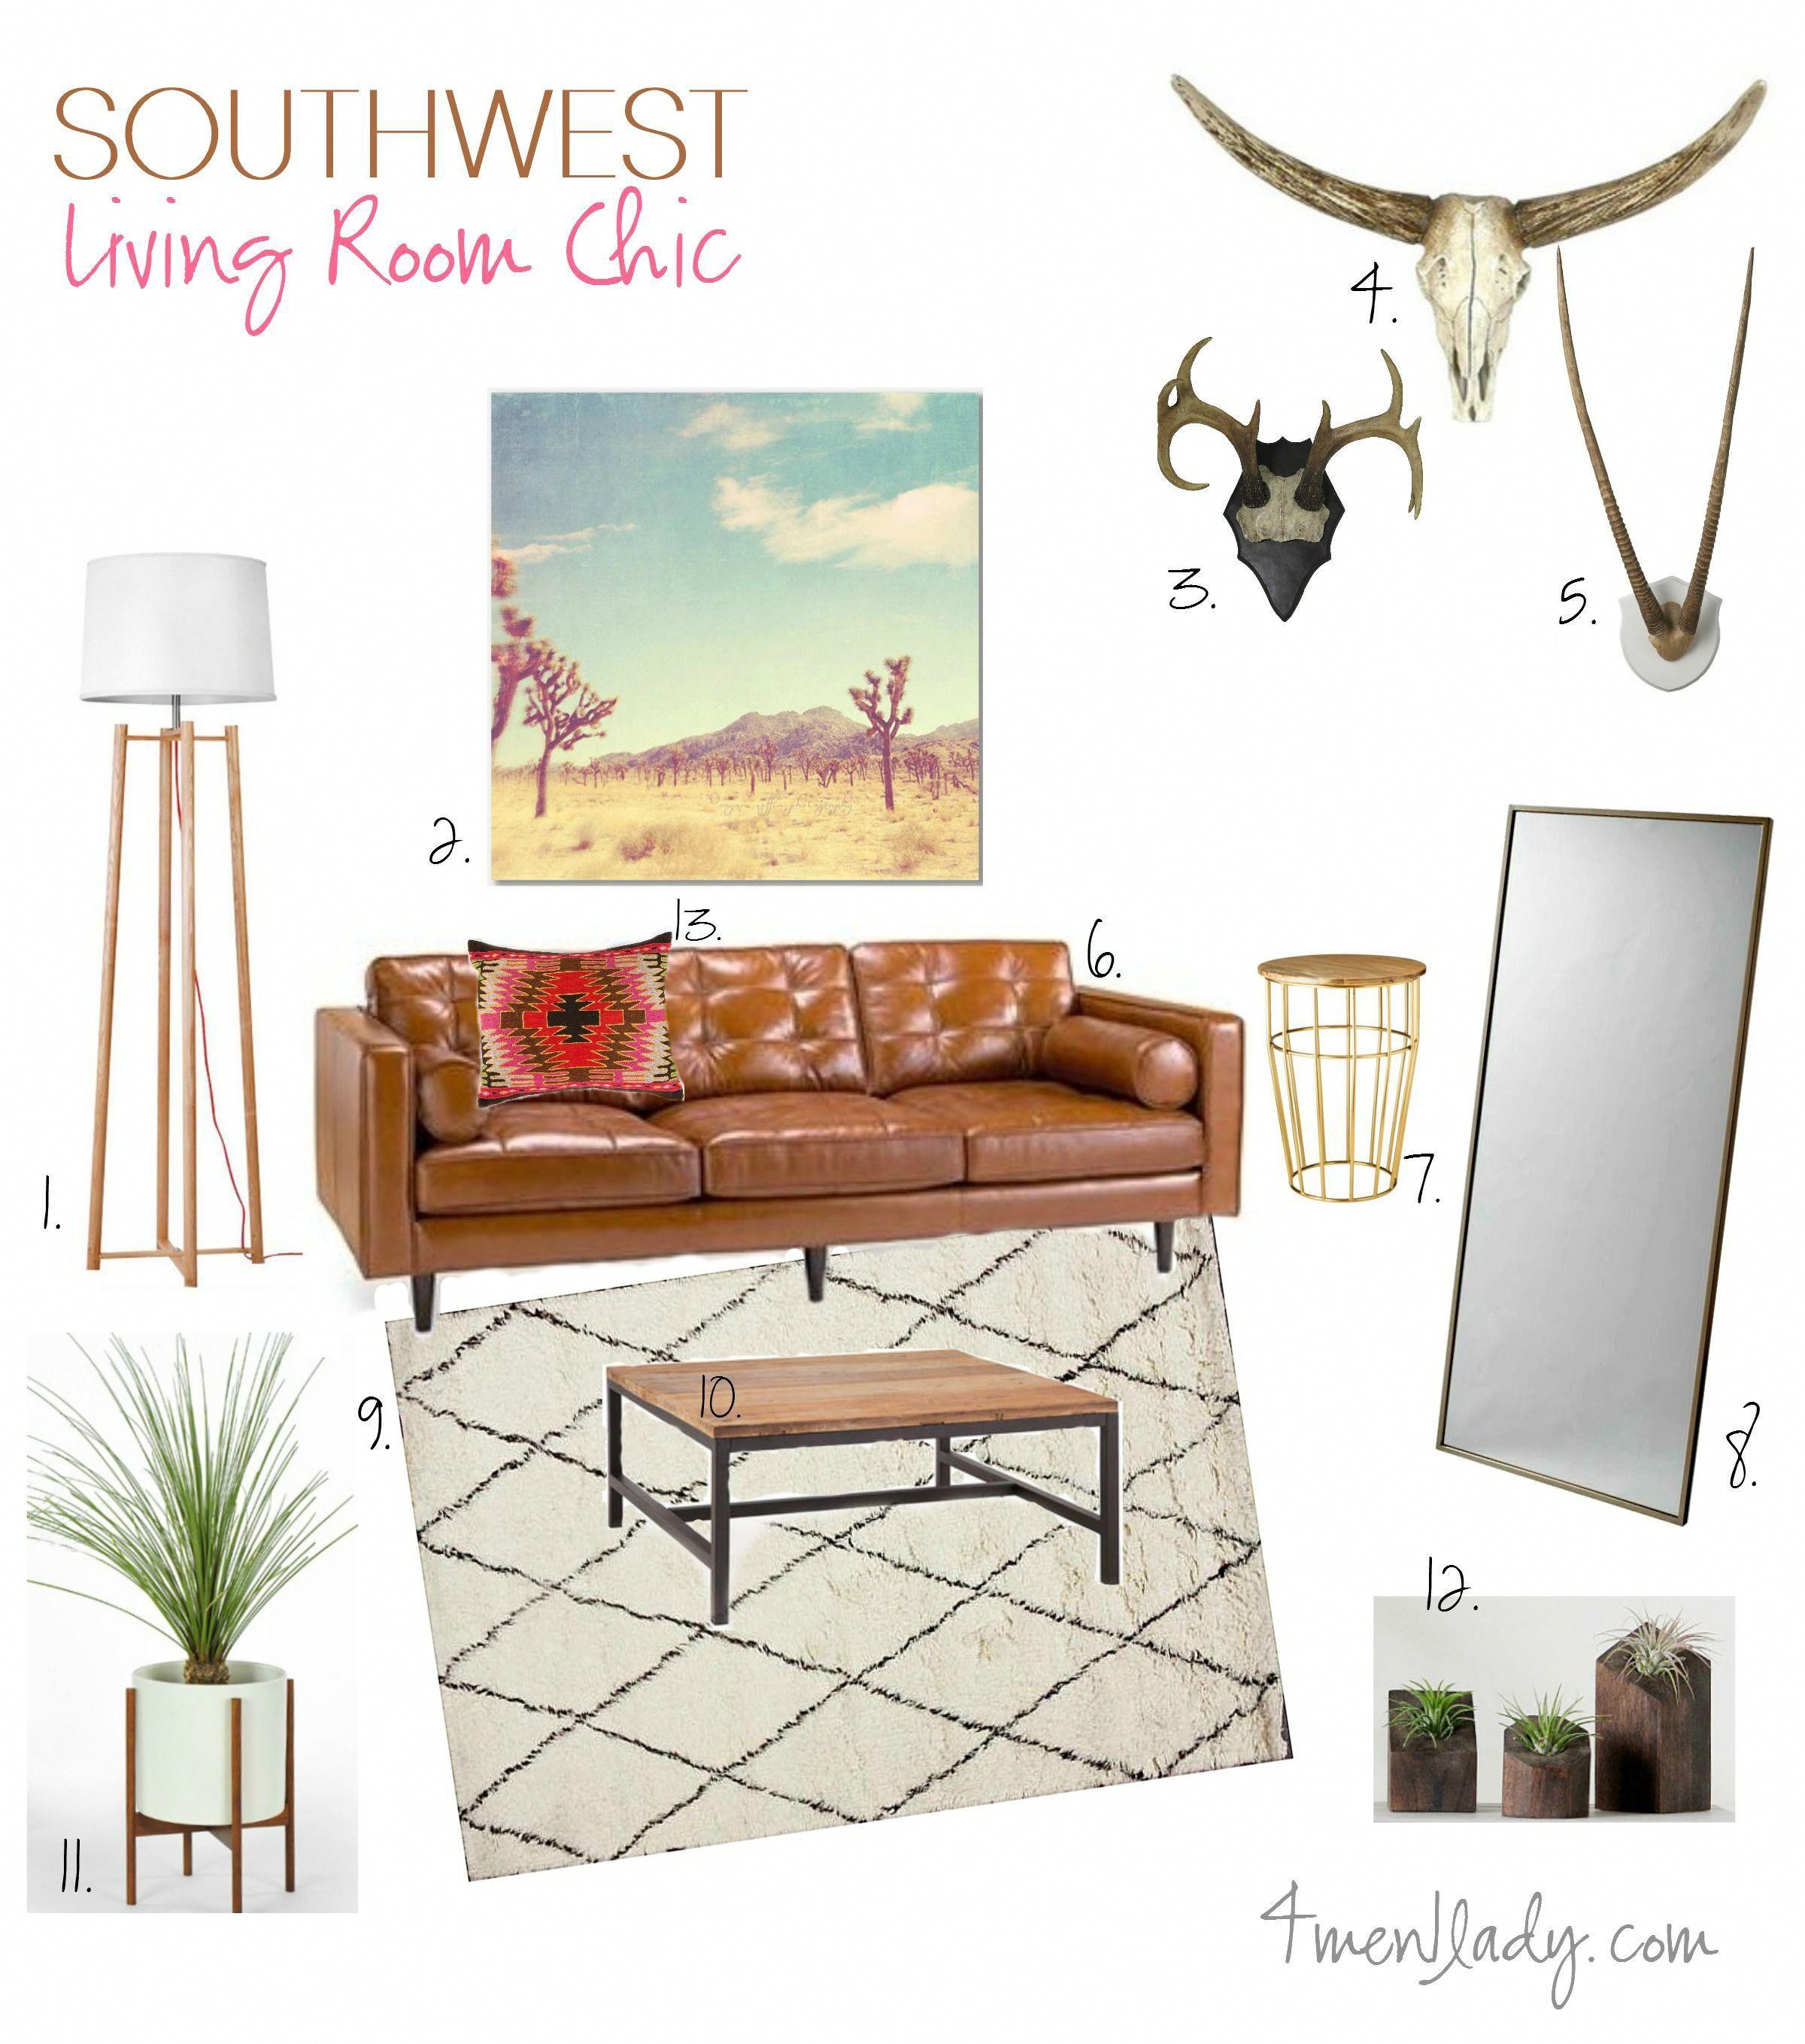 Southwest living room mood board.